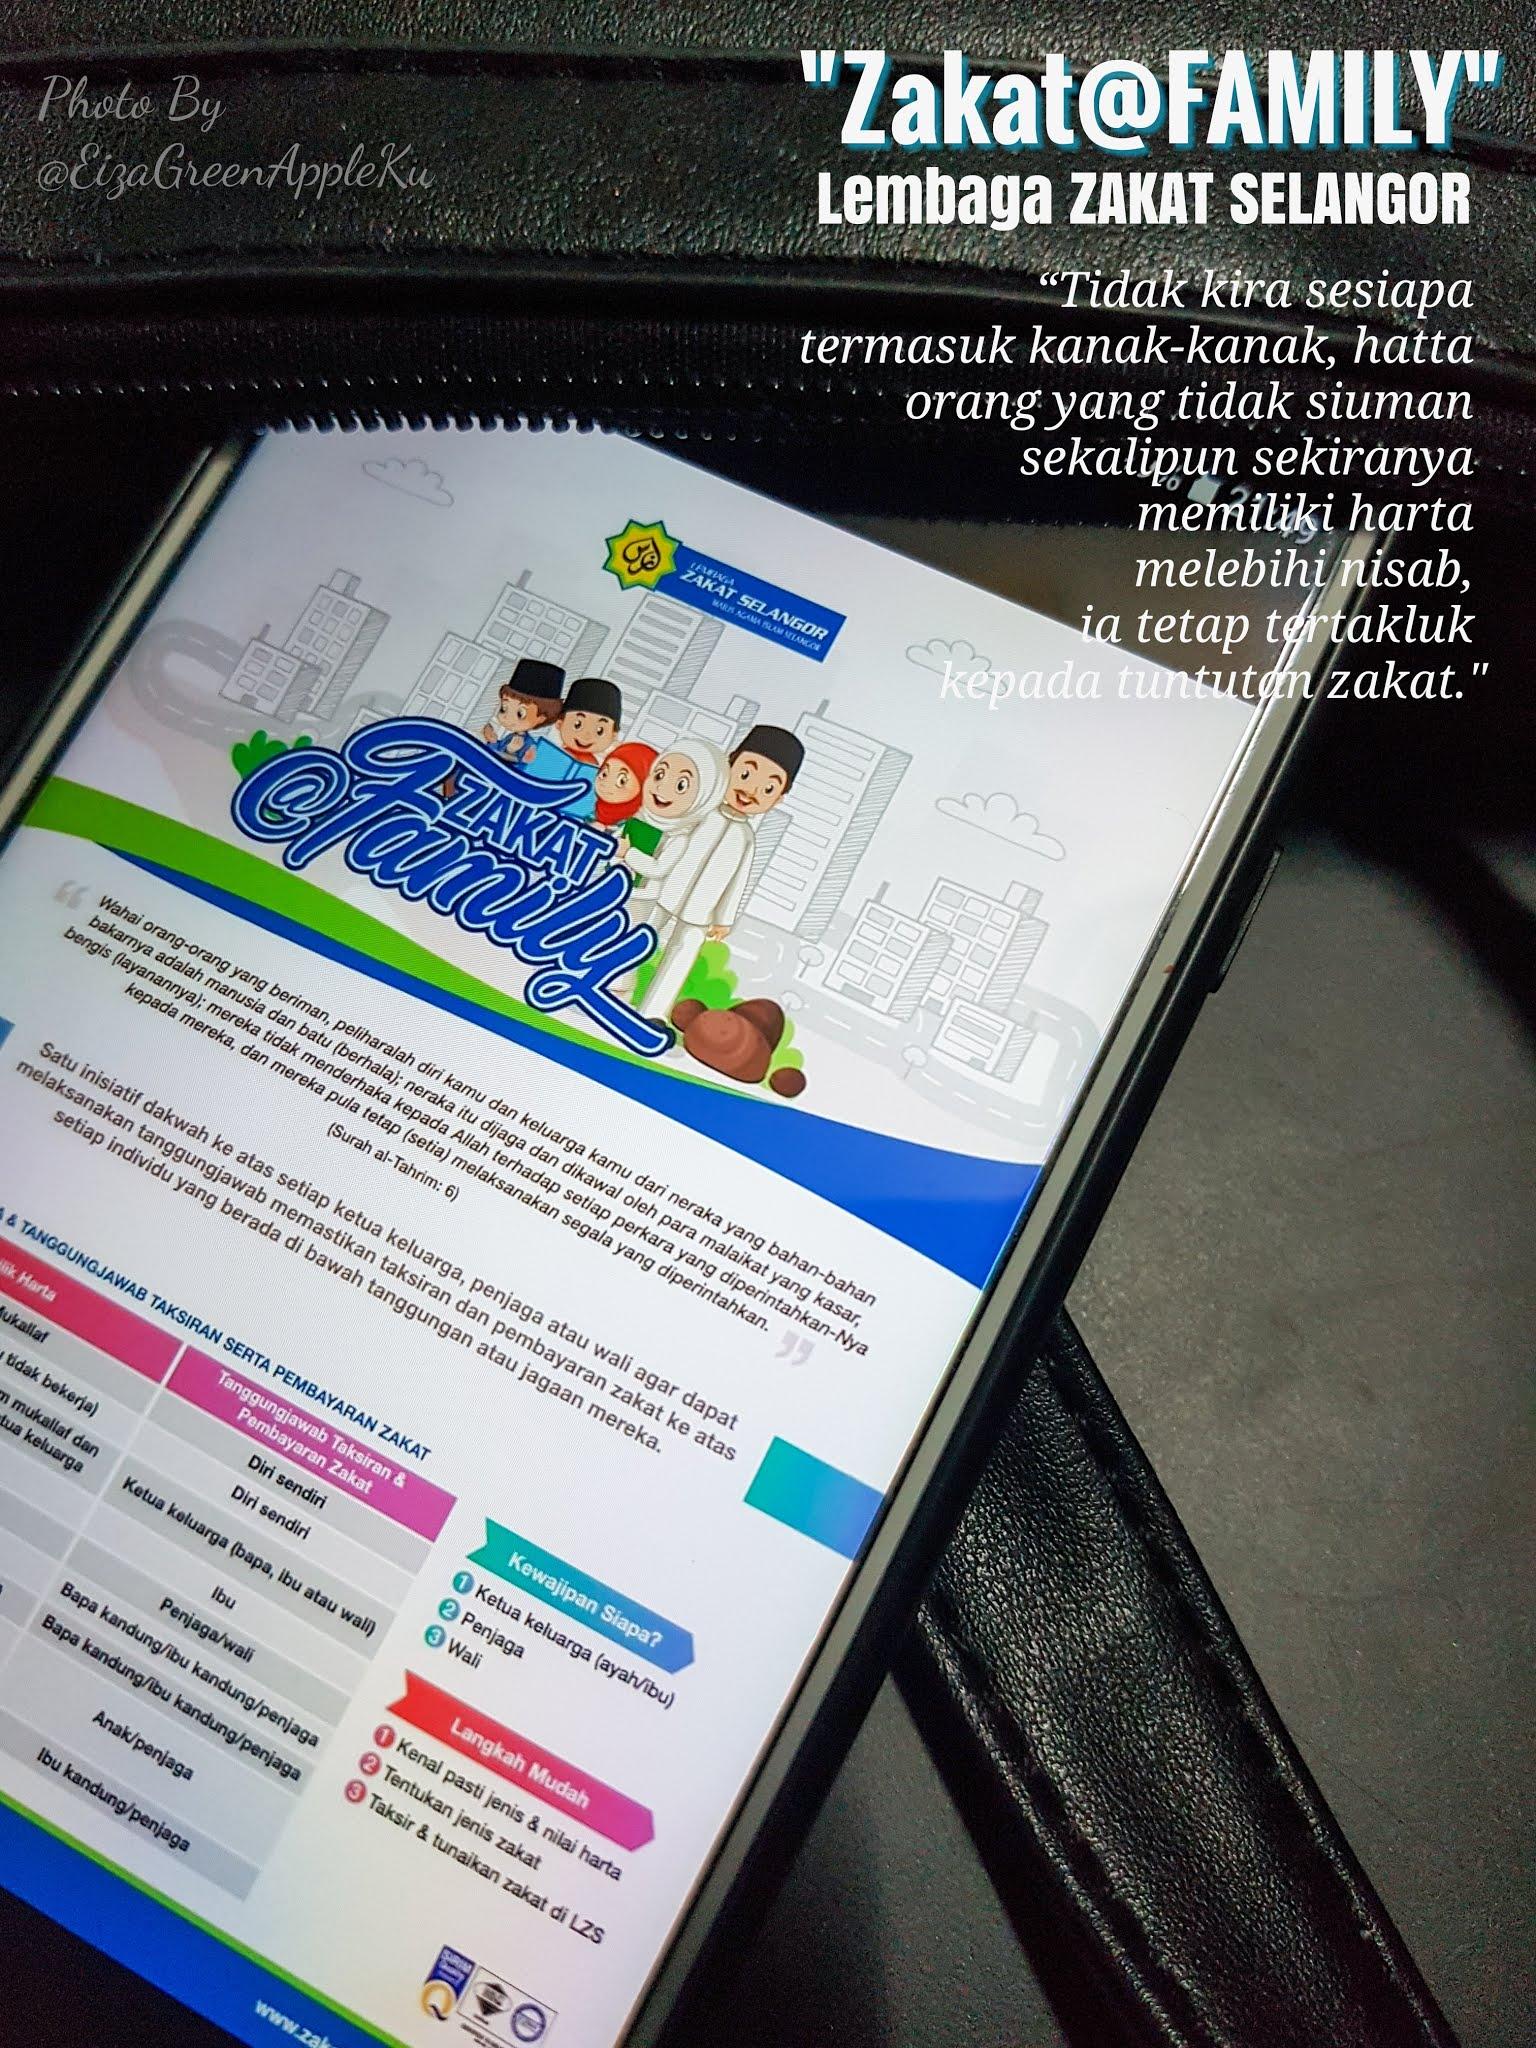 Zakat@Family dari Lembaga Zakat Selangor